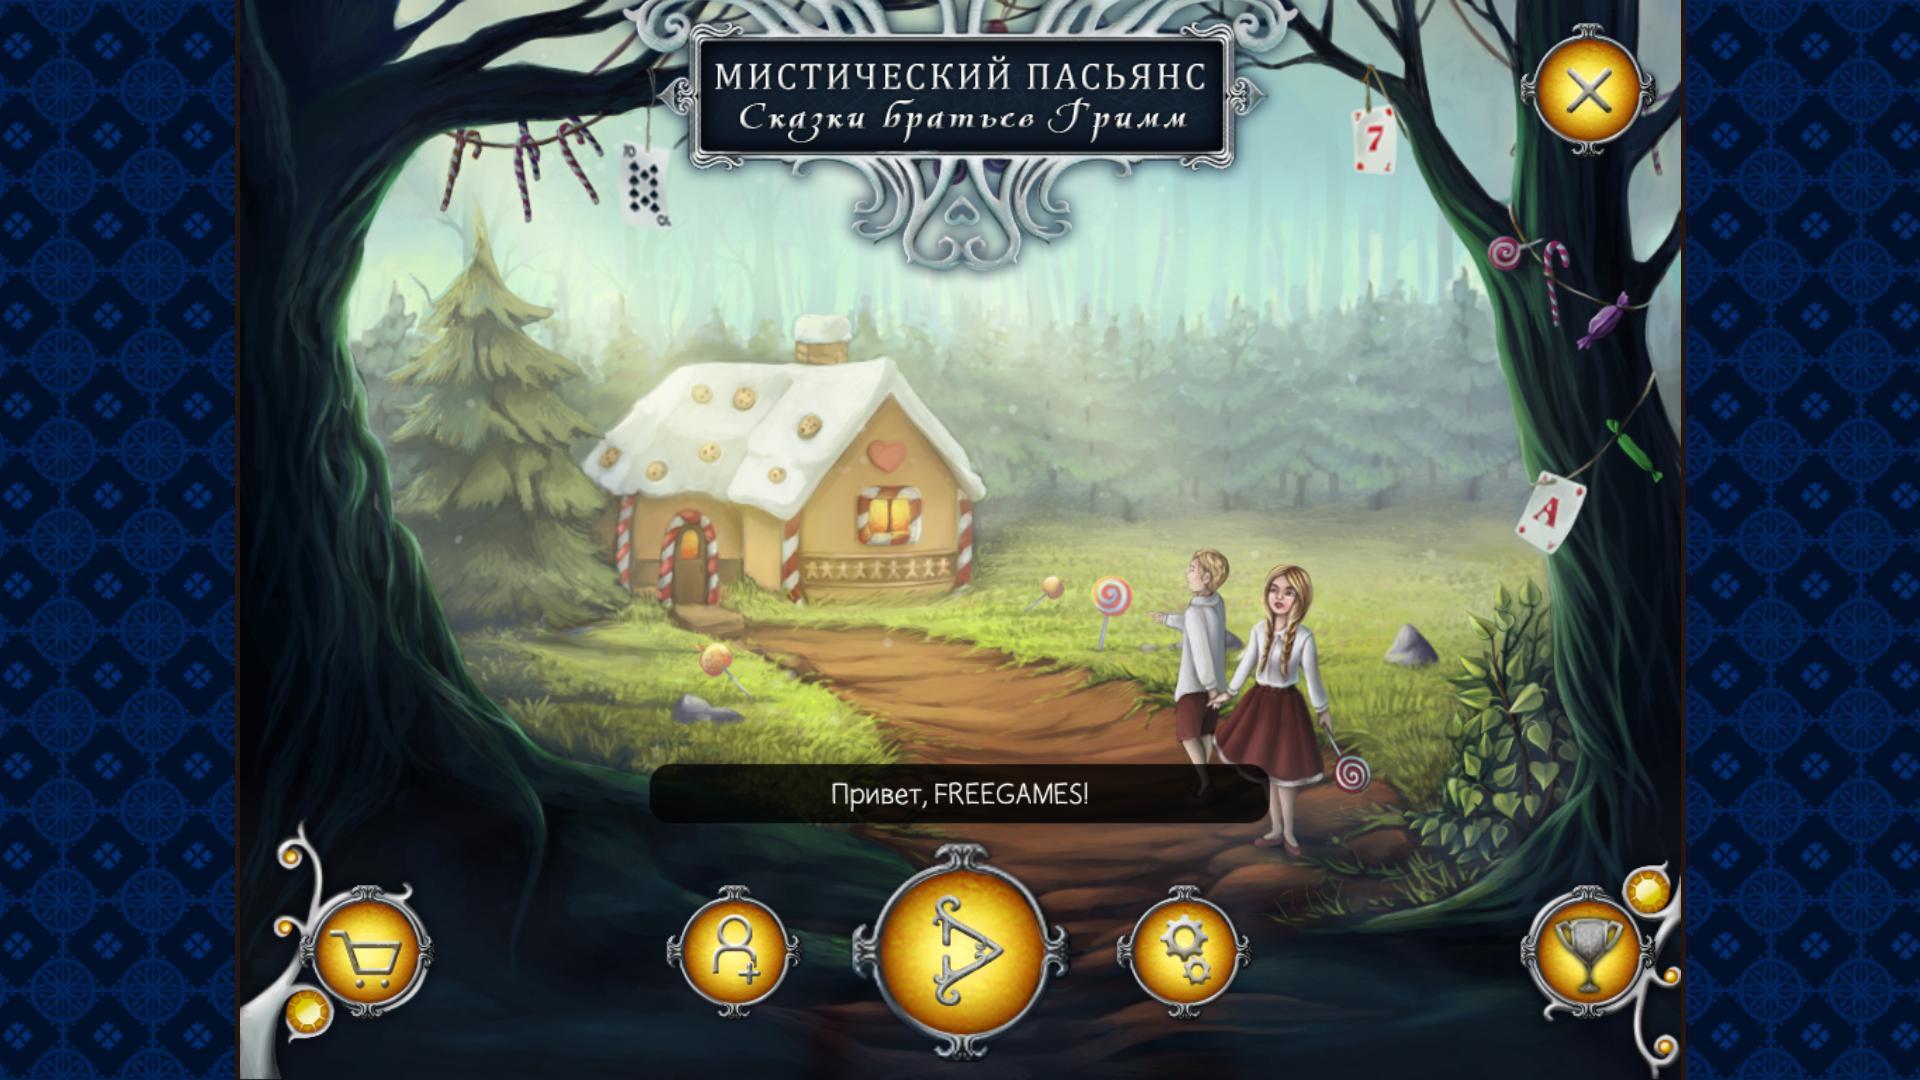 Мистический Пасьянс: Сказки братьев Гримм | Mystery Solitaire: Grimms Tales (Rus)